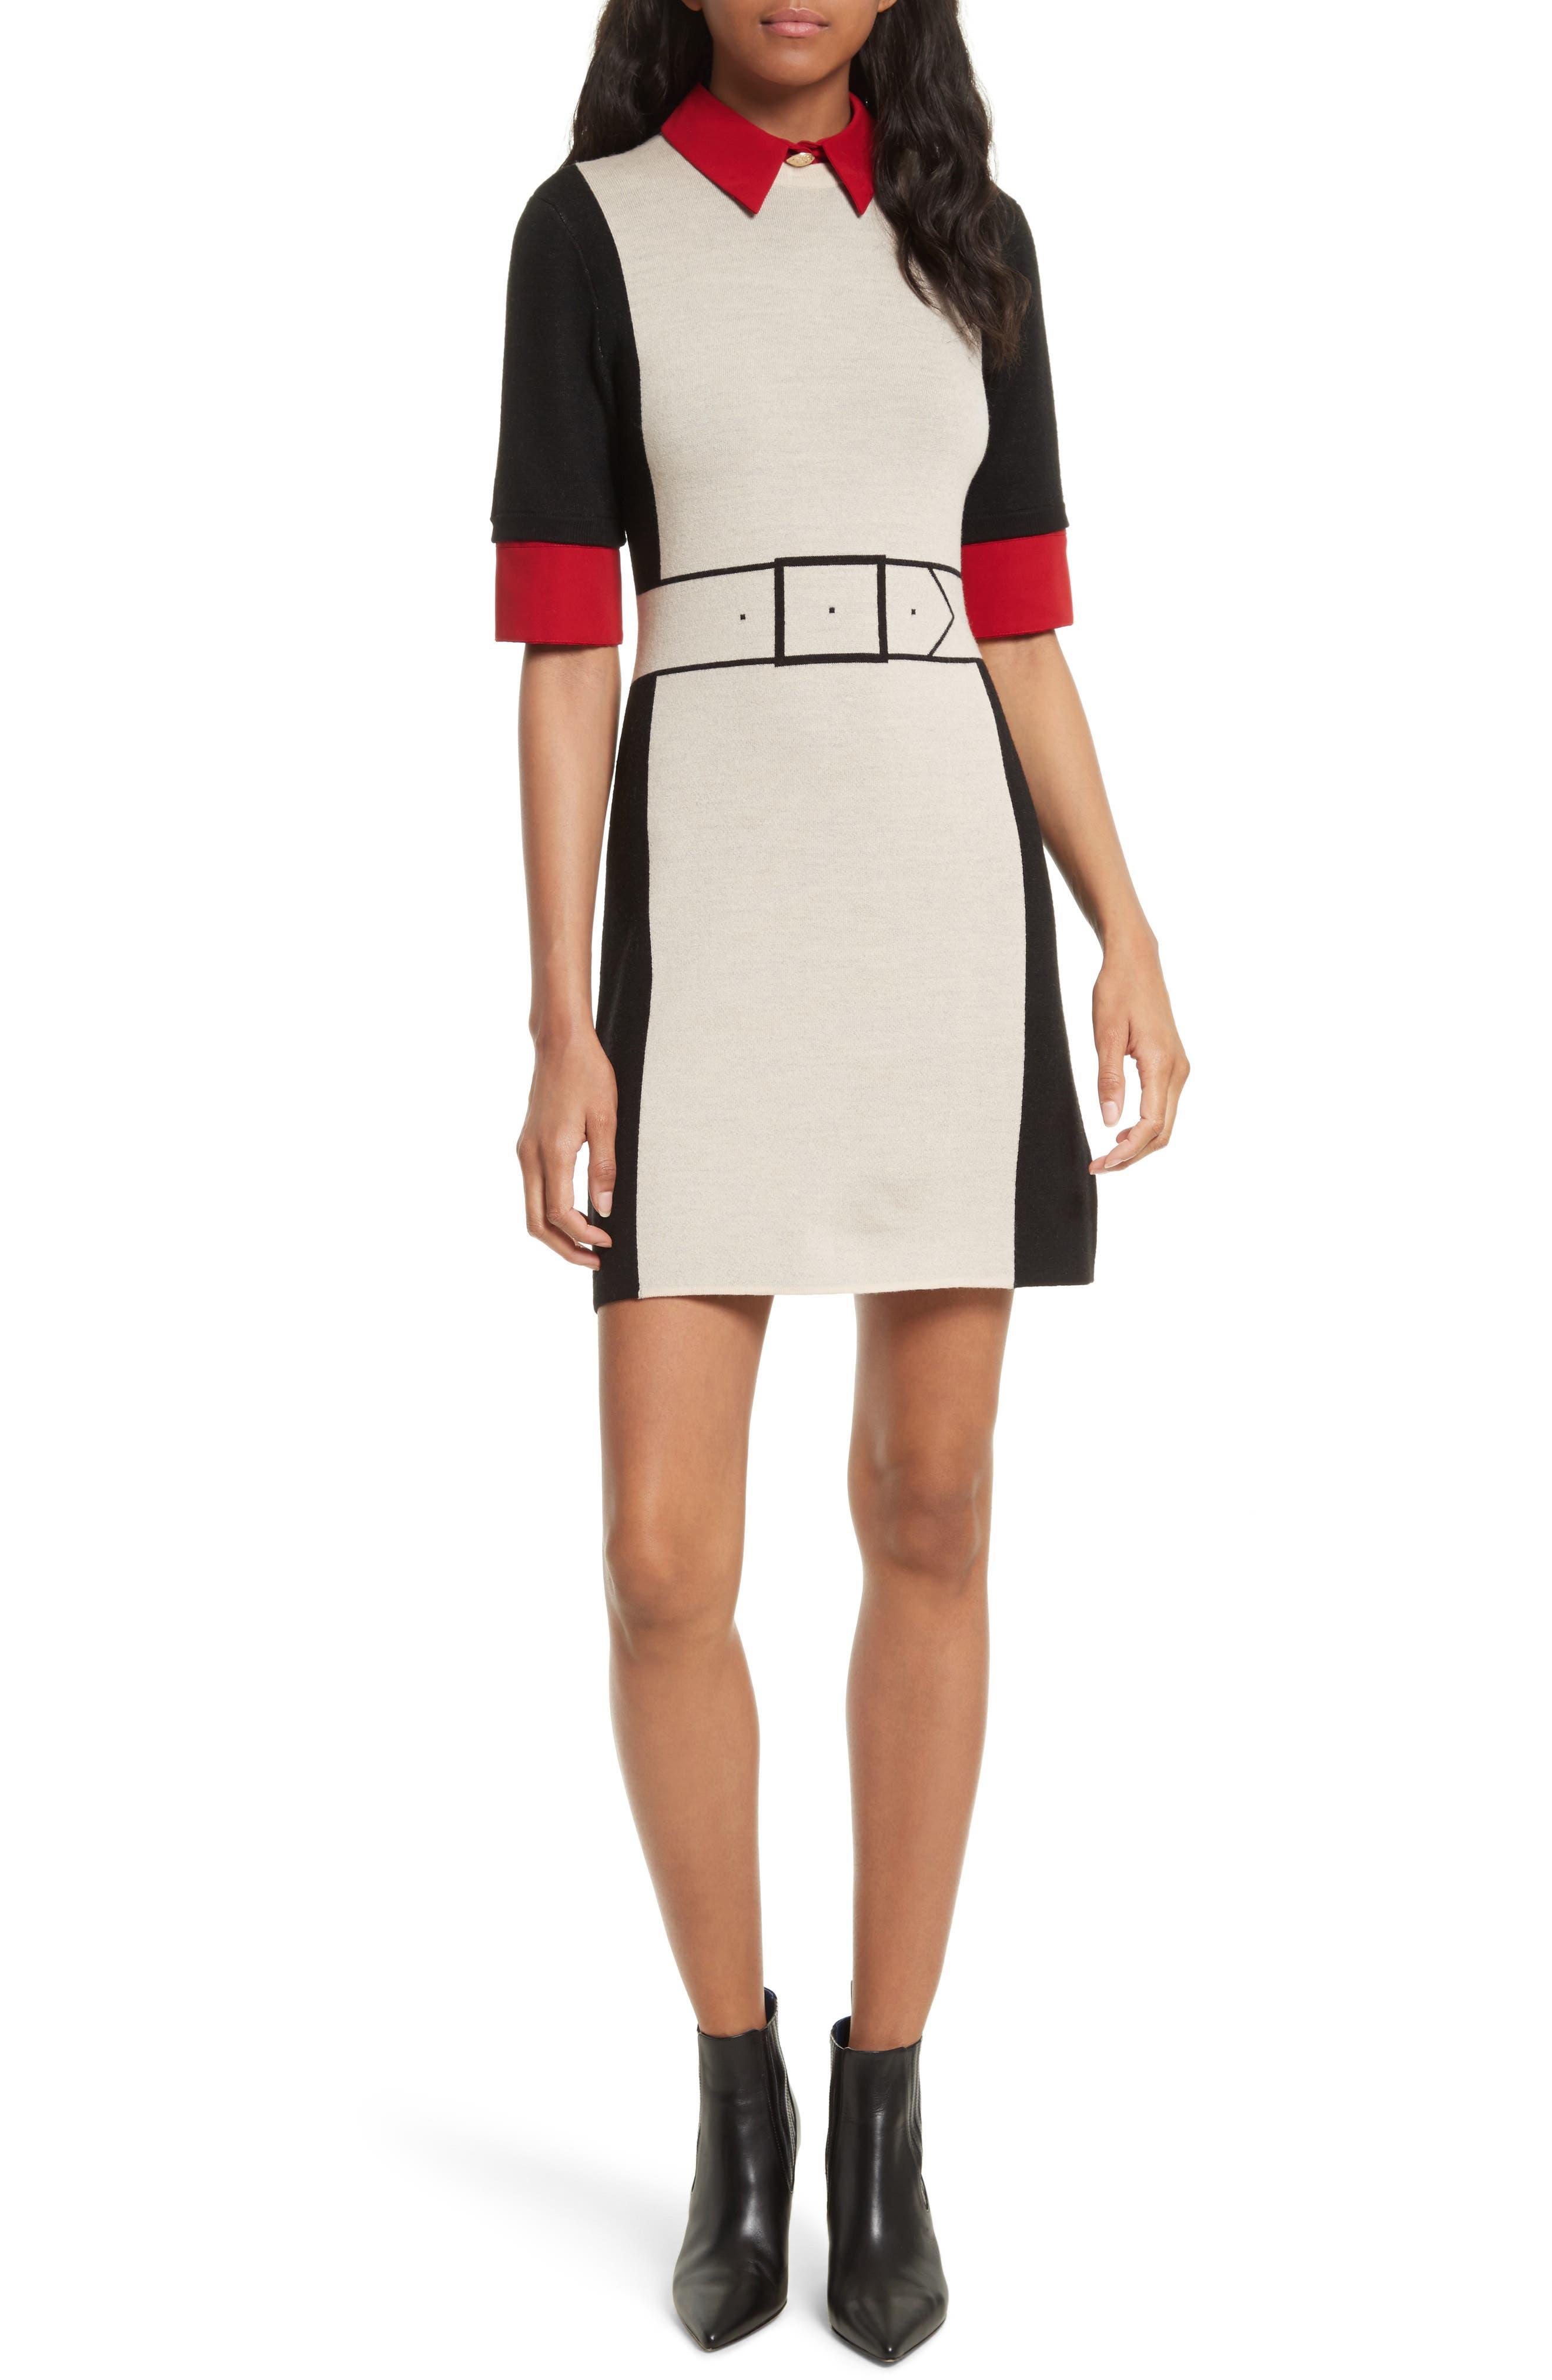 Alice + Olivia Mia Contrast Trim Sweater Dress